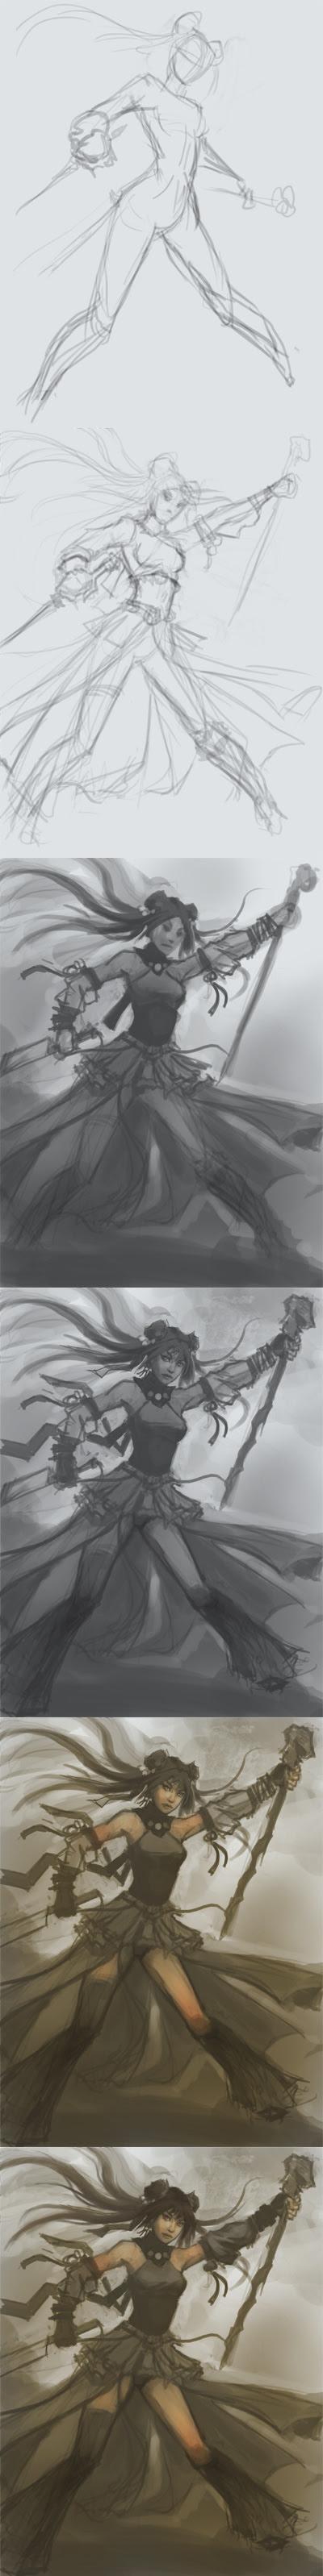 manga tutorial, character design